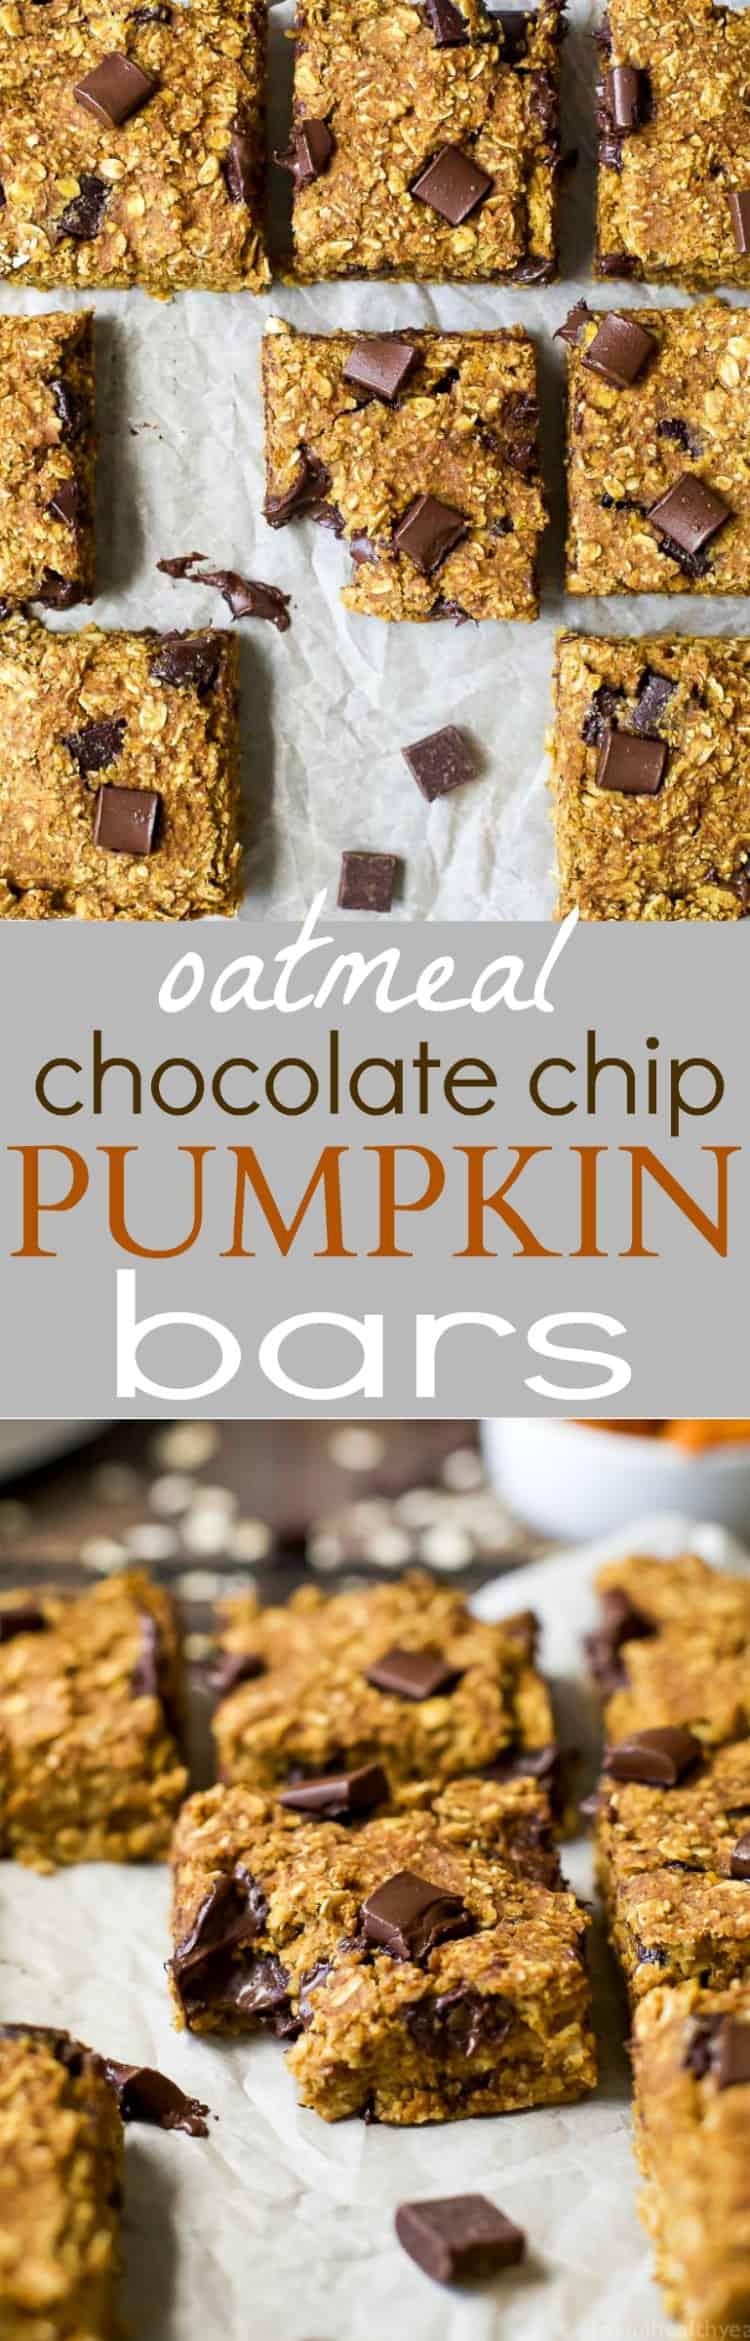 Oatmeal Chocolate Chip Pumpkin Bars Recipe